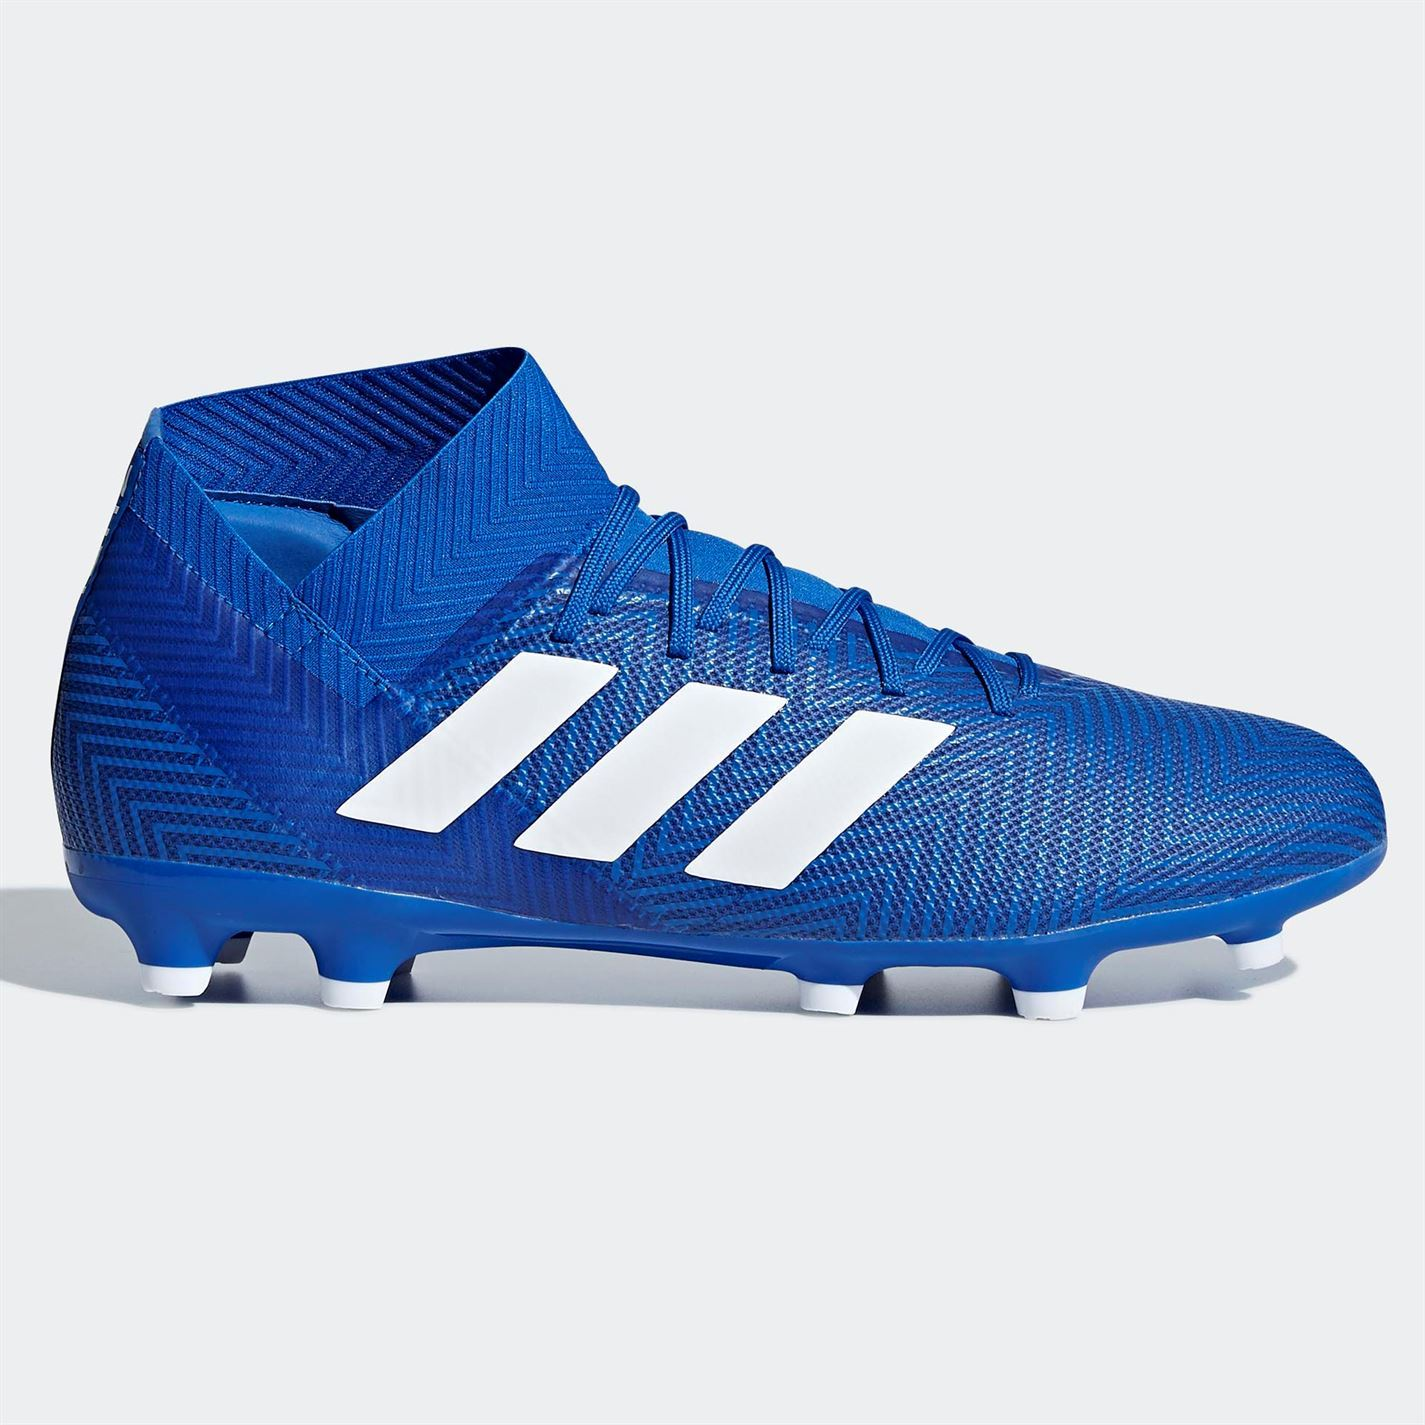 fb9f0491f adidas Nemeziz 18.3 FG Firm Ground Football Boots Mens Soccer Shoes Cleats